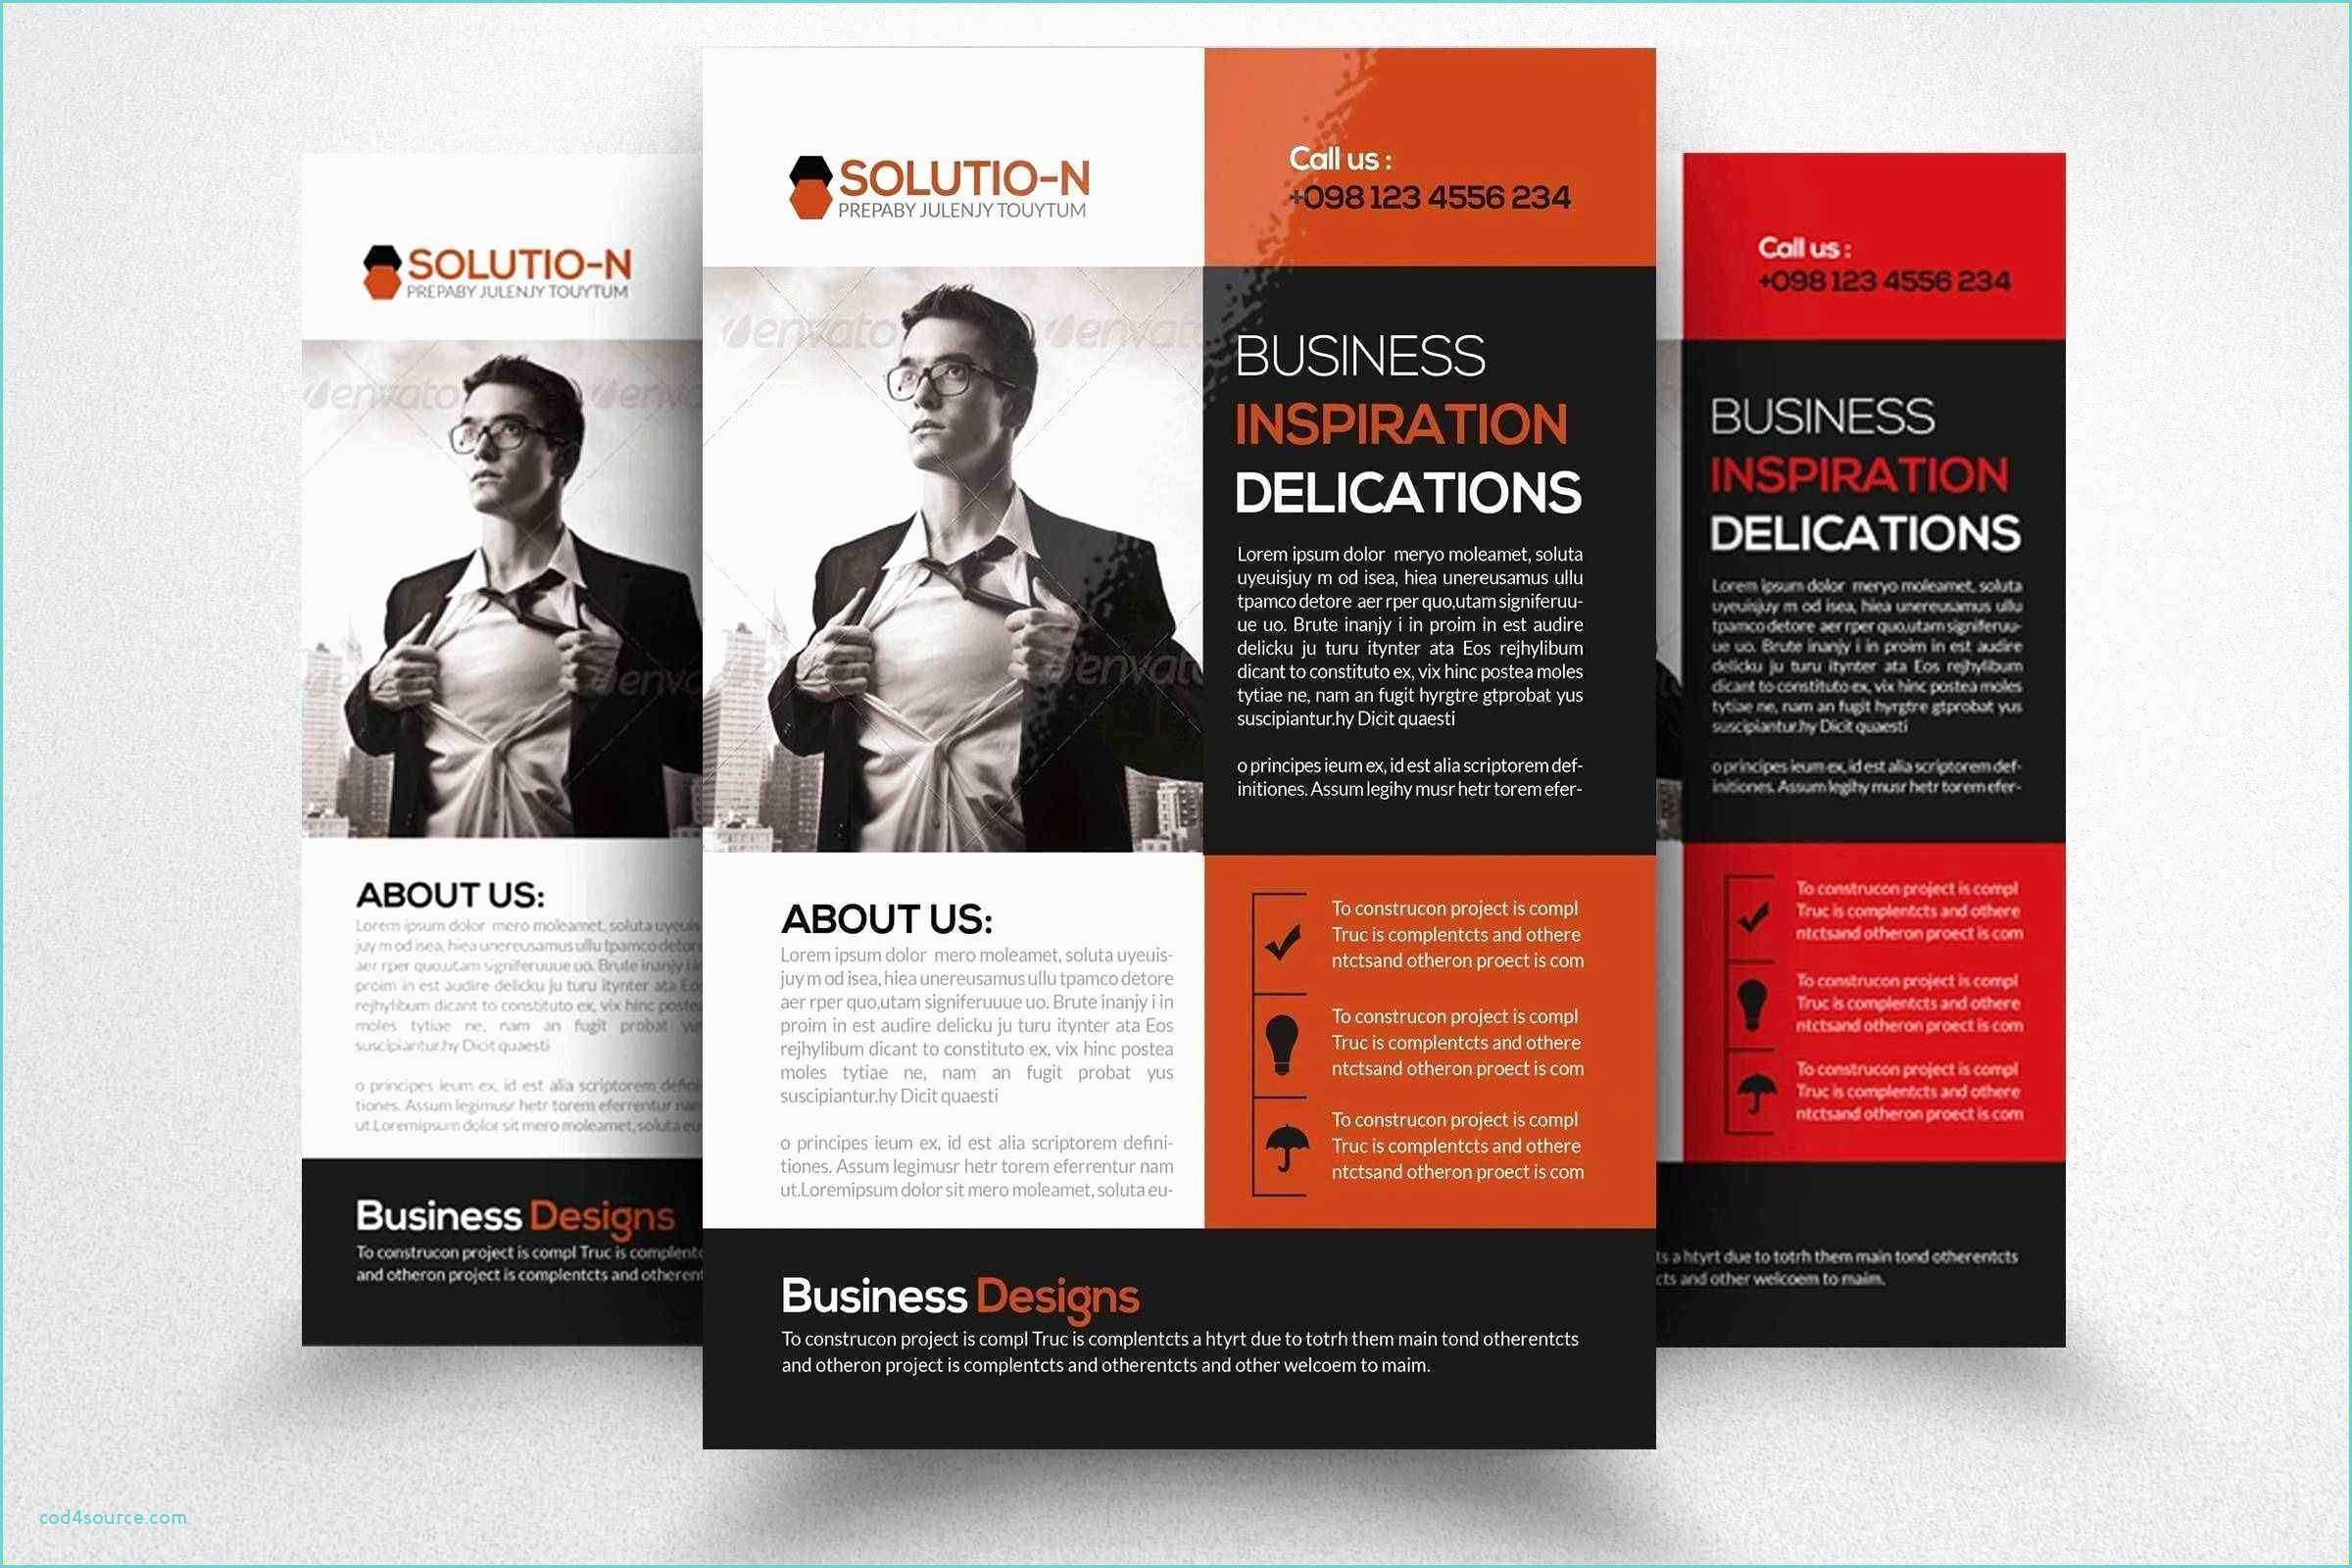 028 Healthcare Brochure Templates Free Medical Template Idea With Healthcare Brochure Templates Free Download